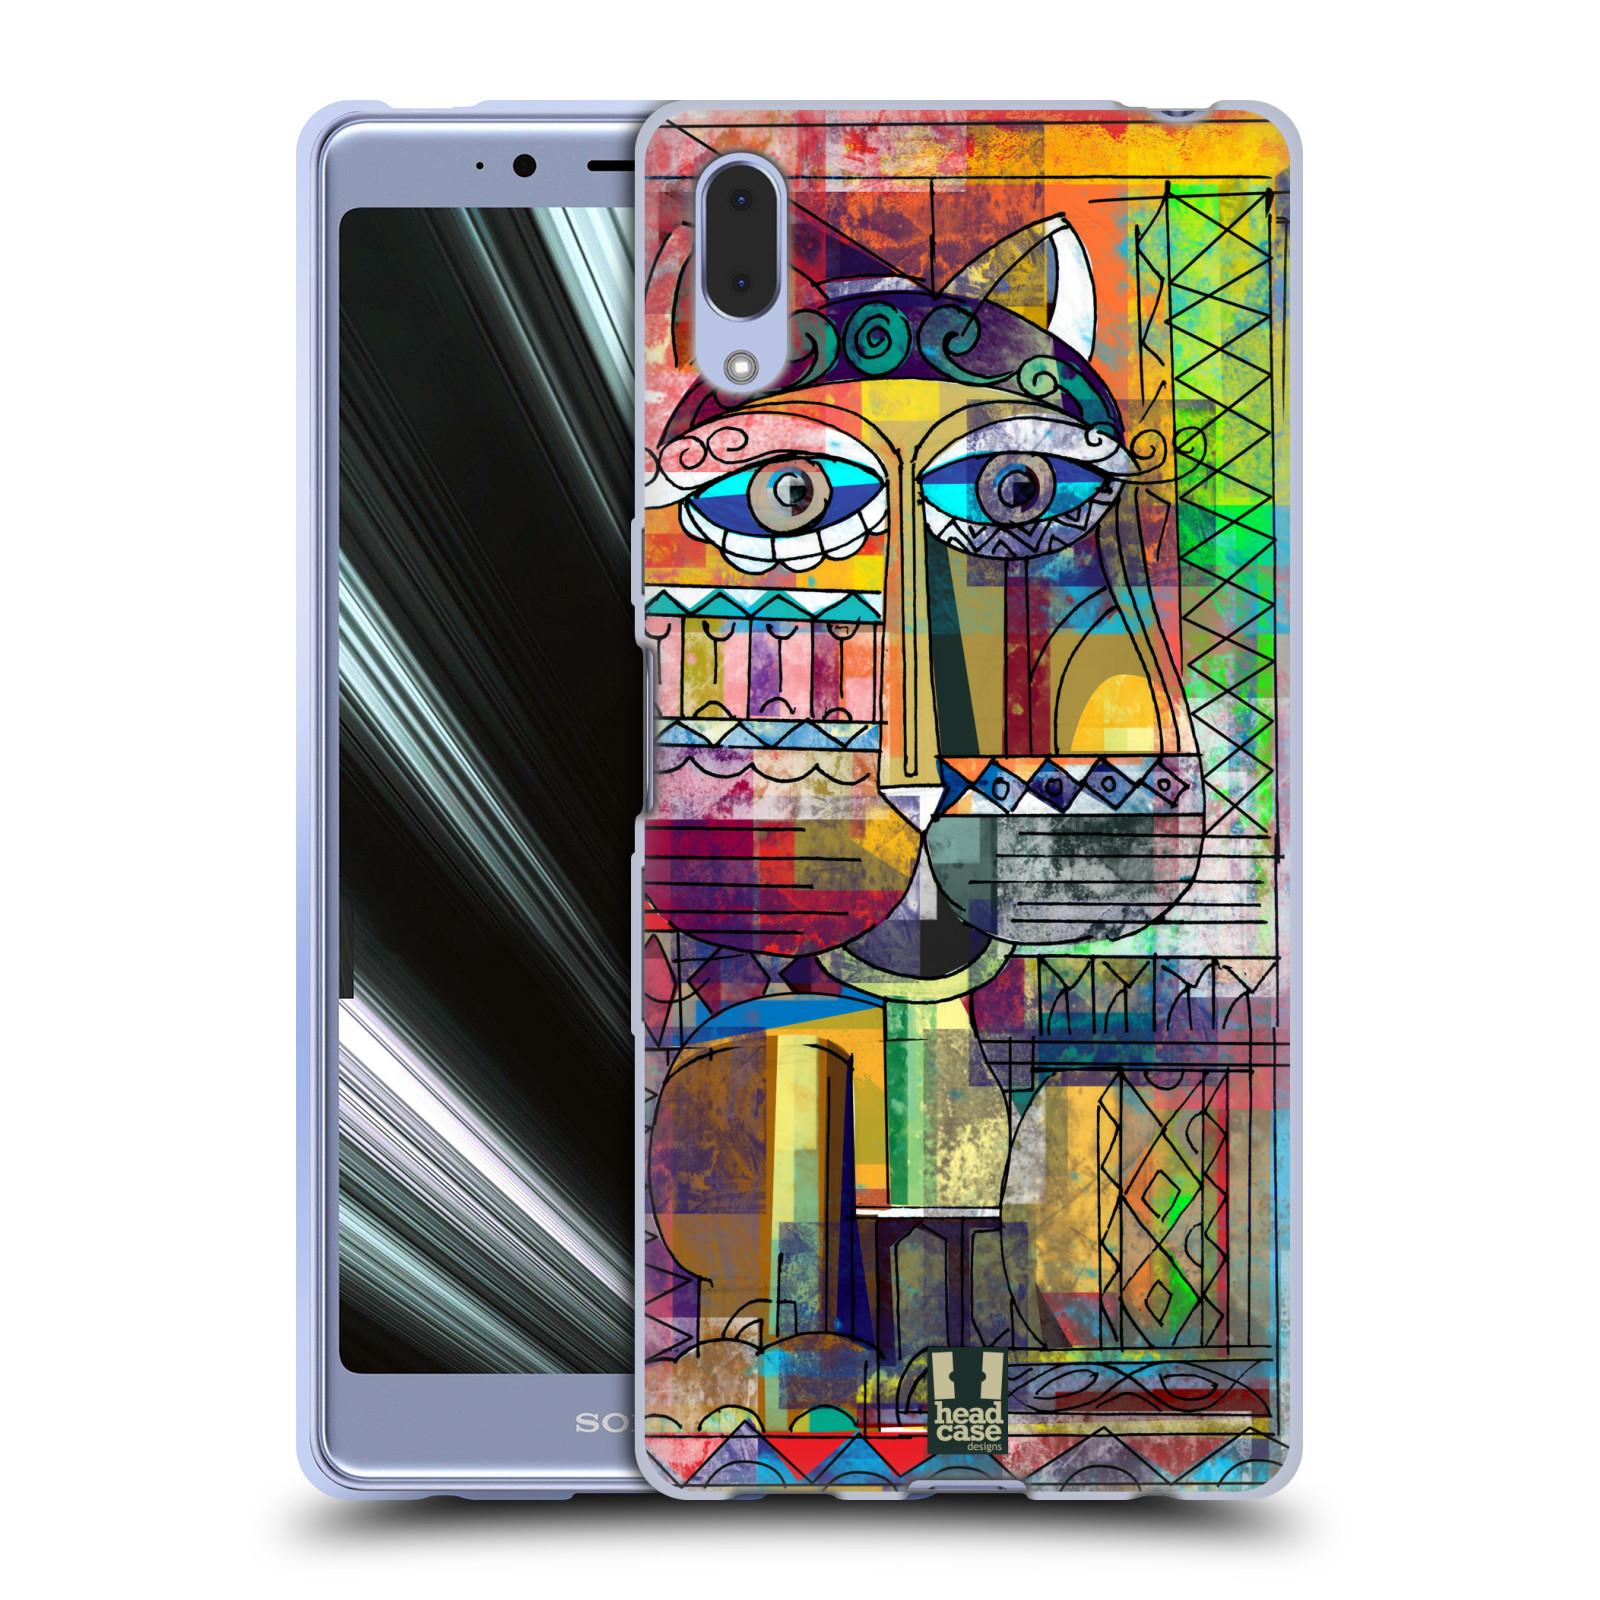 Silikonové pouzdro na mobil Sony Xperia L3 - Head Case - AZTEC KORAT